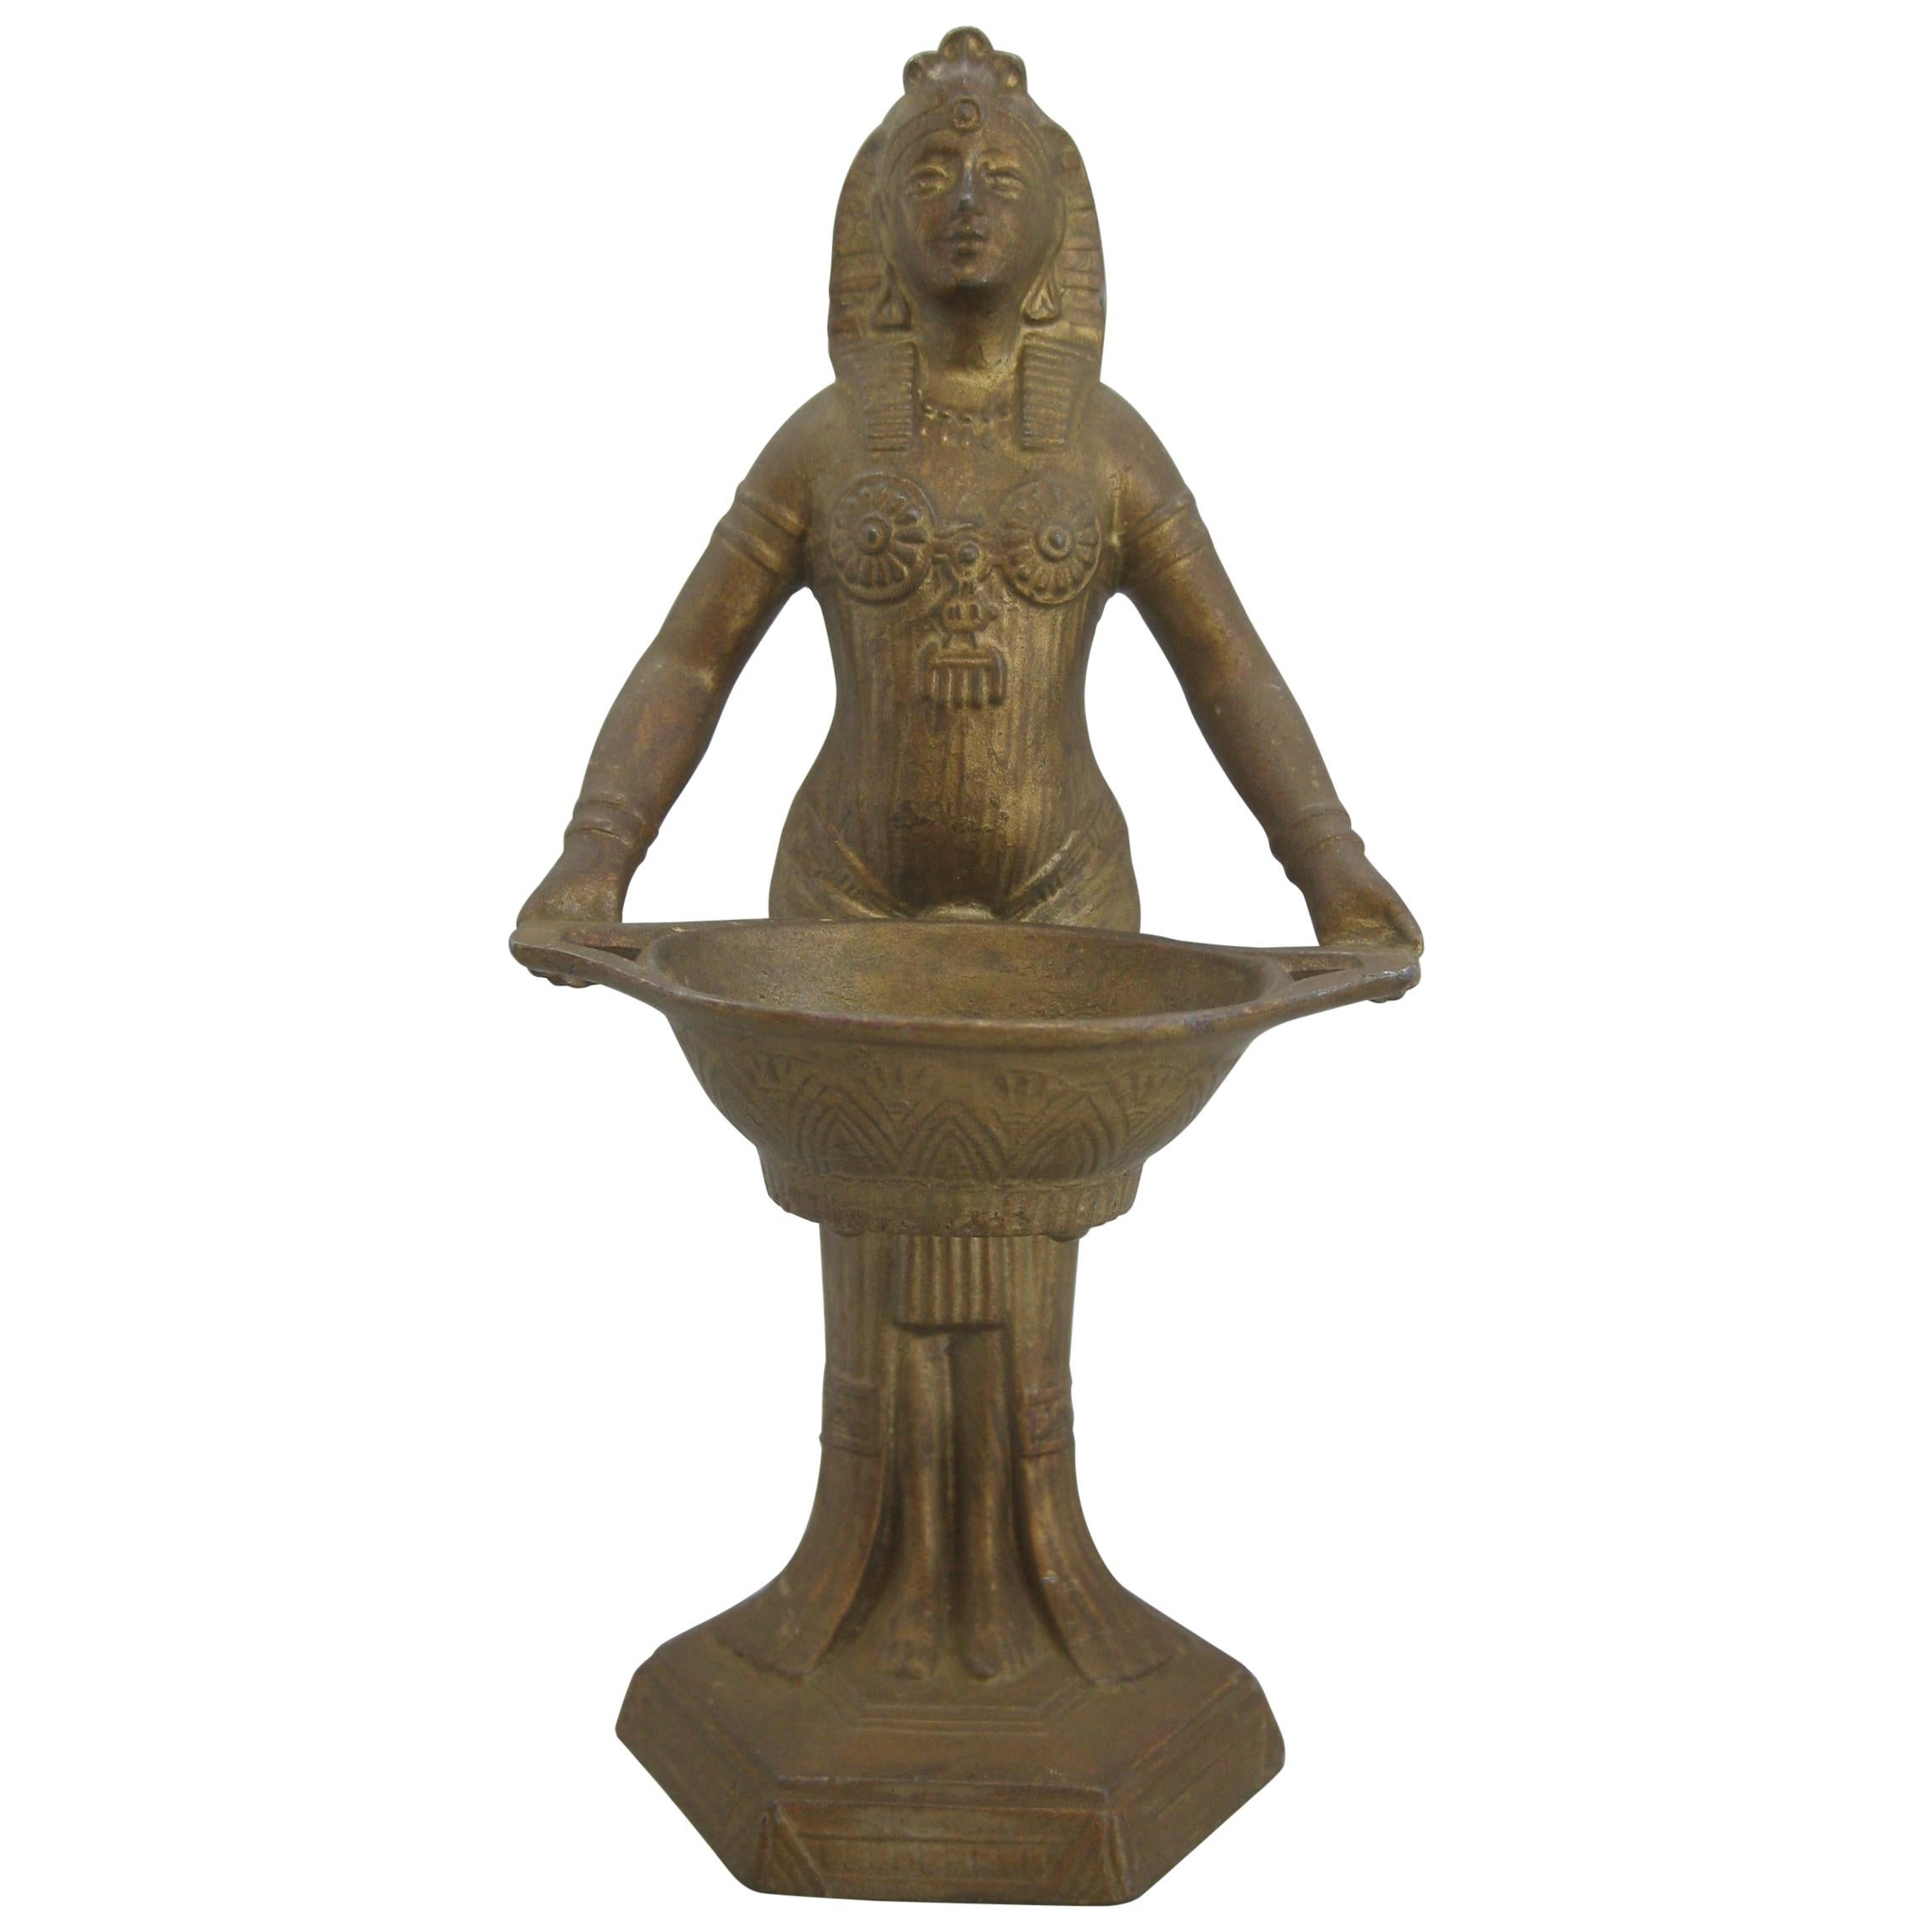 Antique Vantines French Art Deco Egyptian Revival Figural Metal Incense Burner